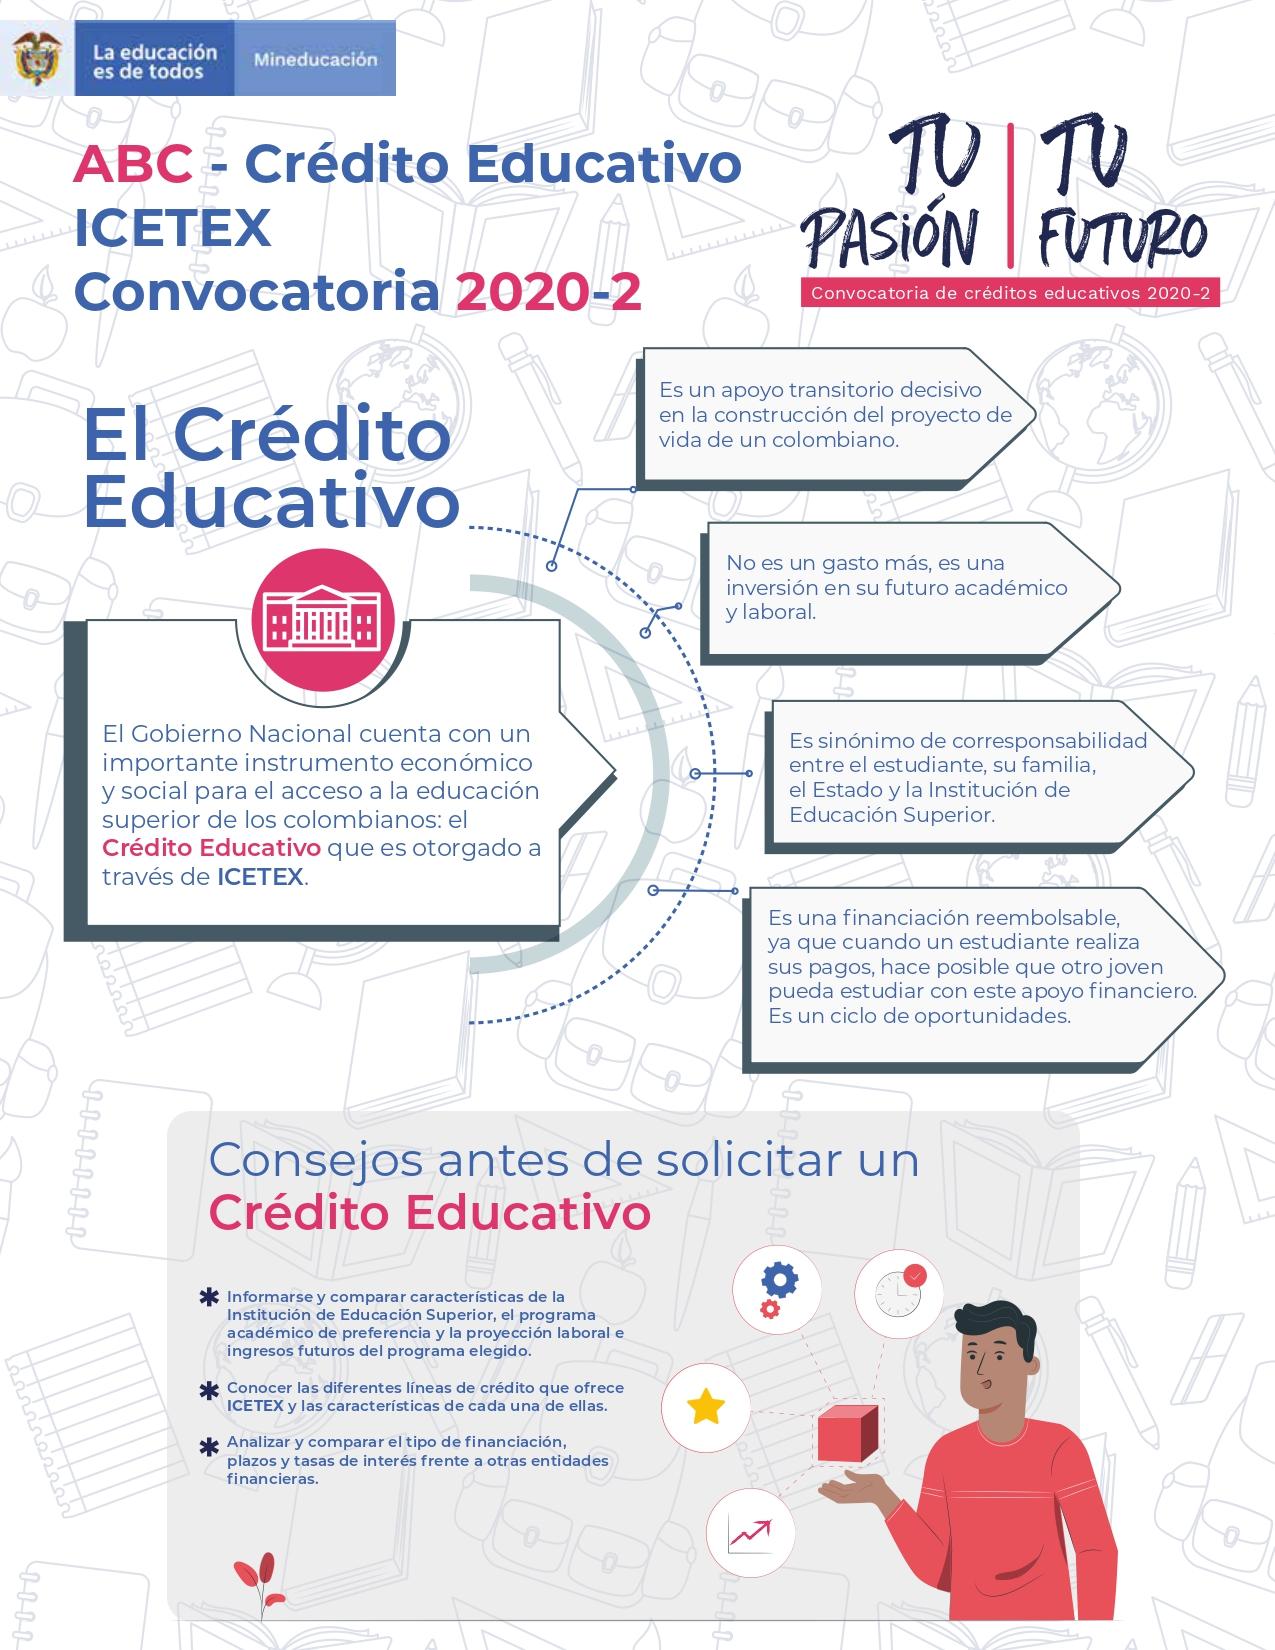 Crédito educativo ICETEX 2020-2